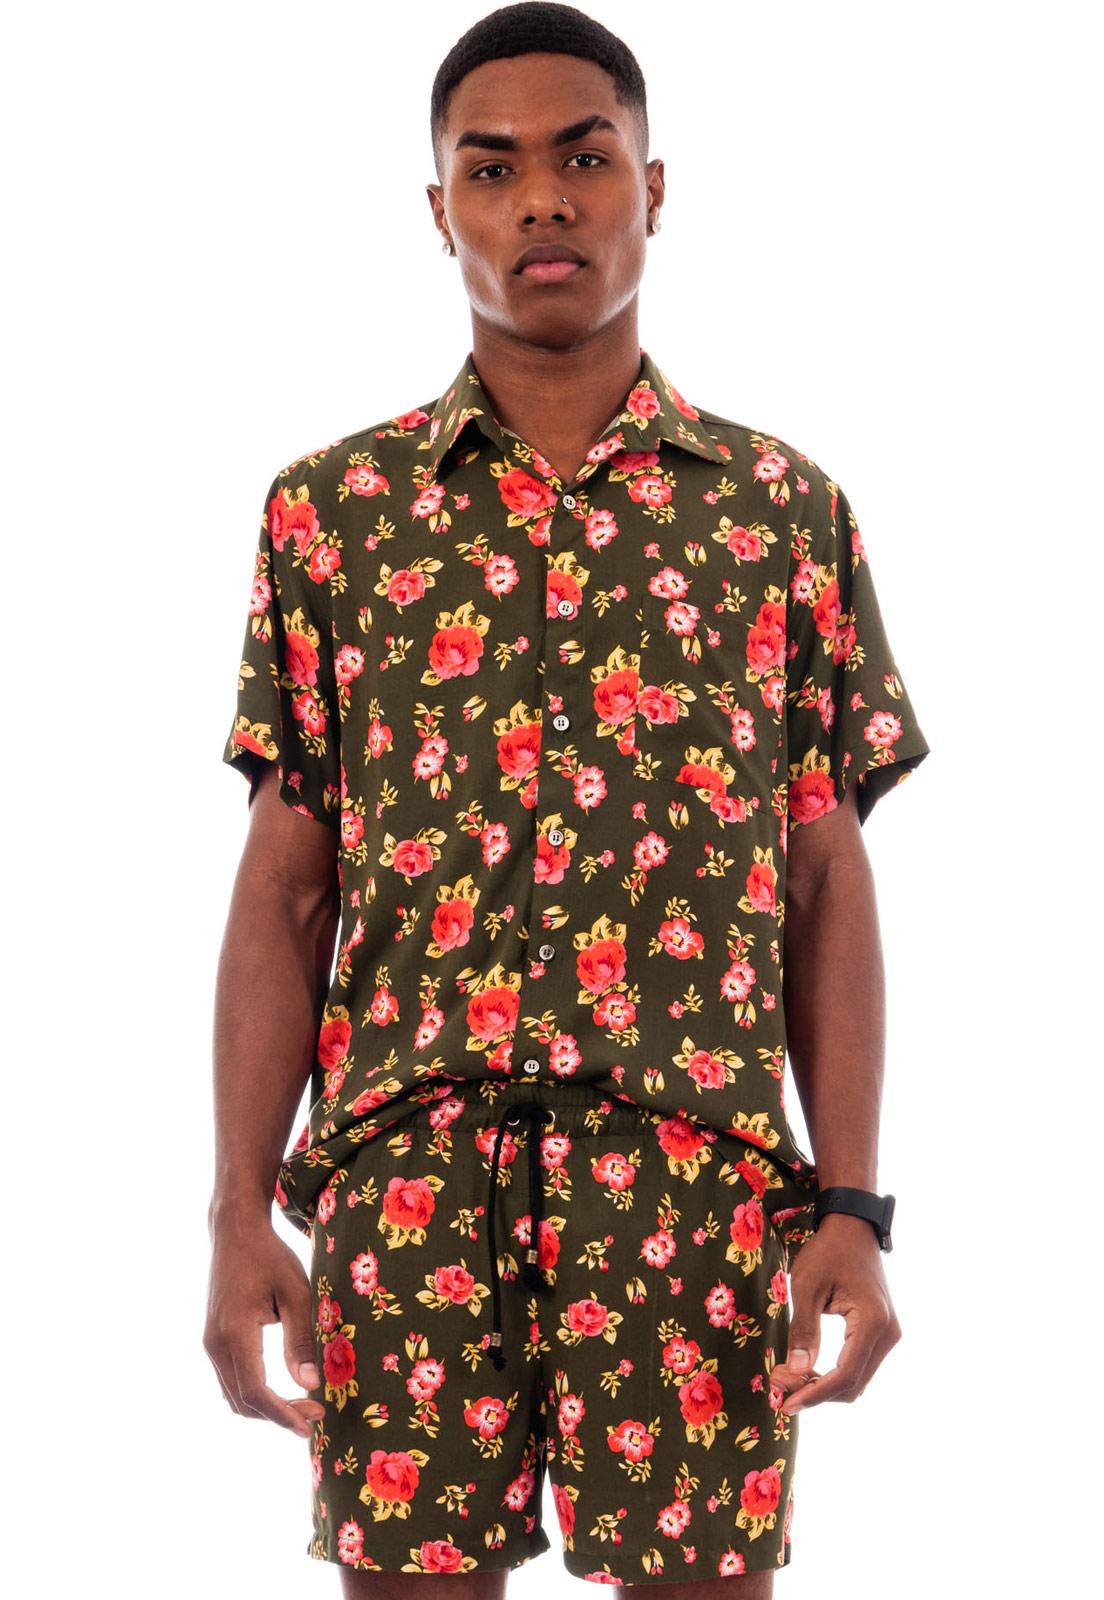 Camisa Floral Florida Estampada Roma Lácio ElephunK Verde